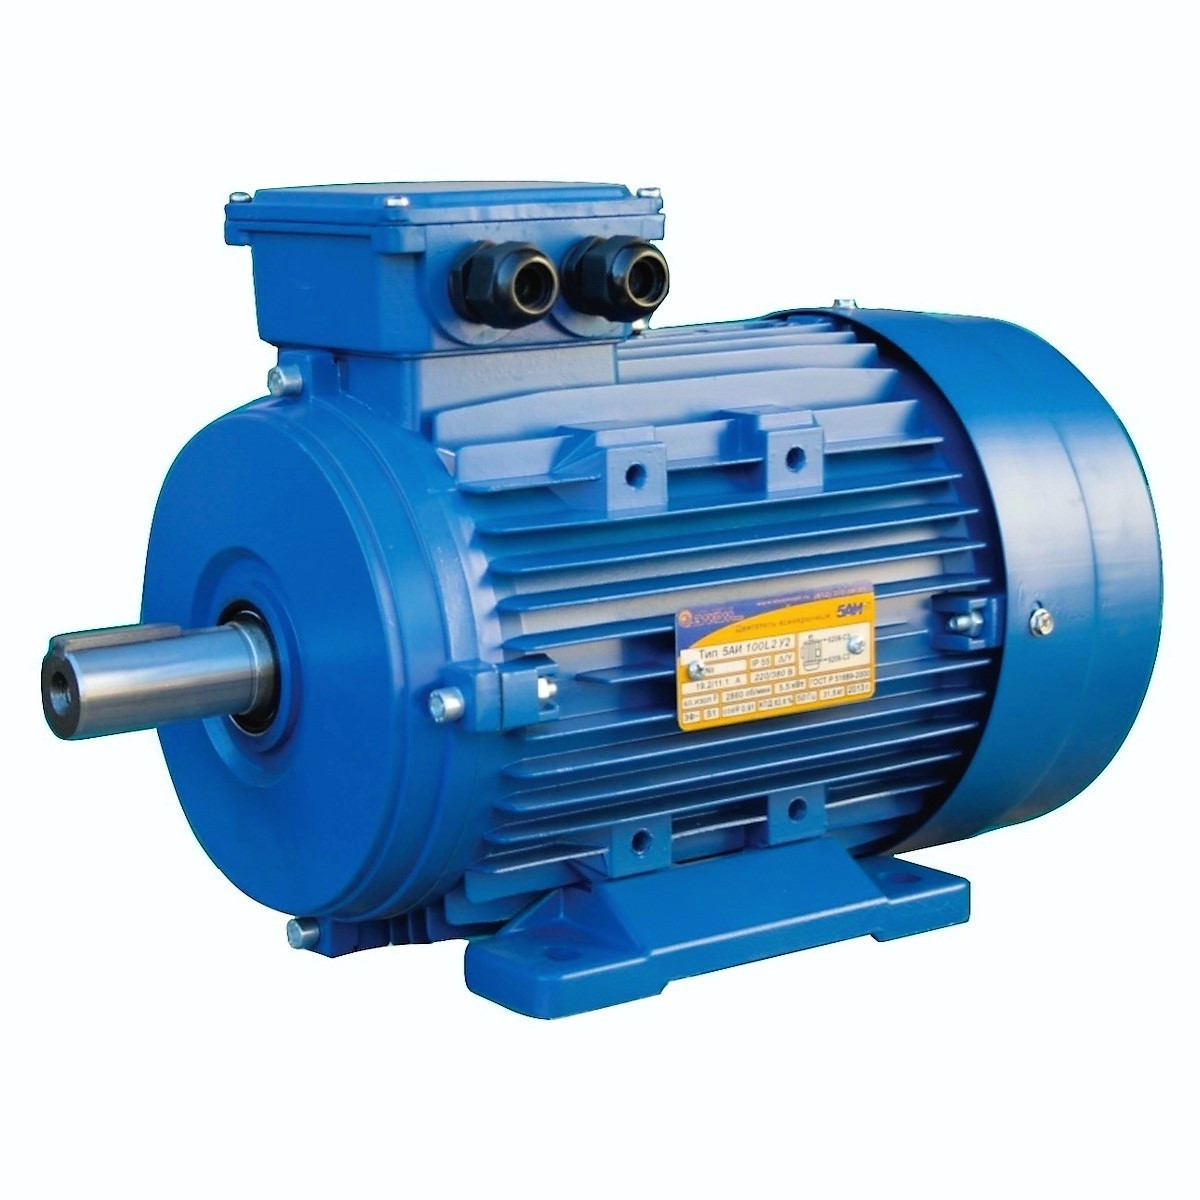 Электродвигатель 5АИ 100 S4 3кВт, 1500 об/мин